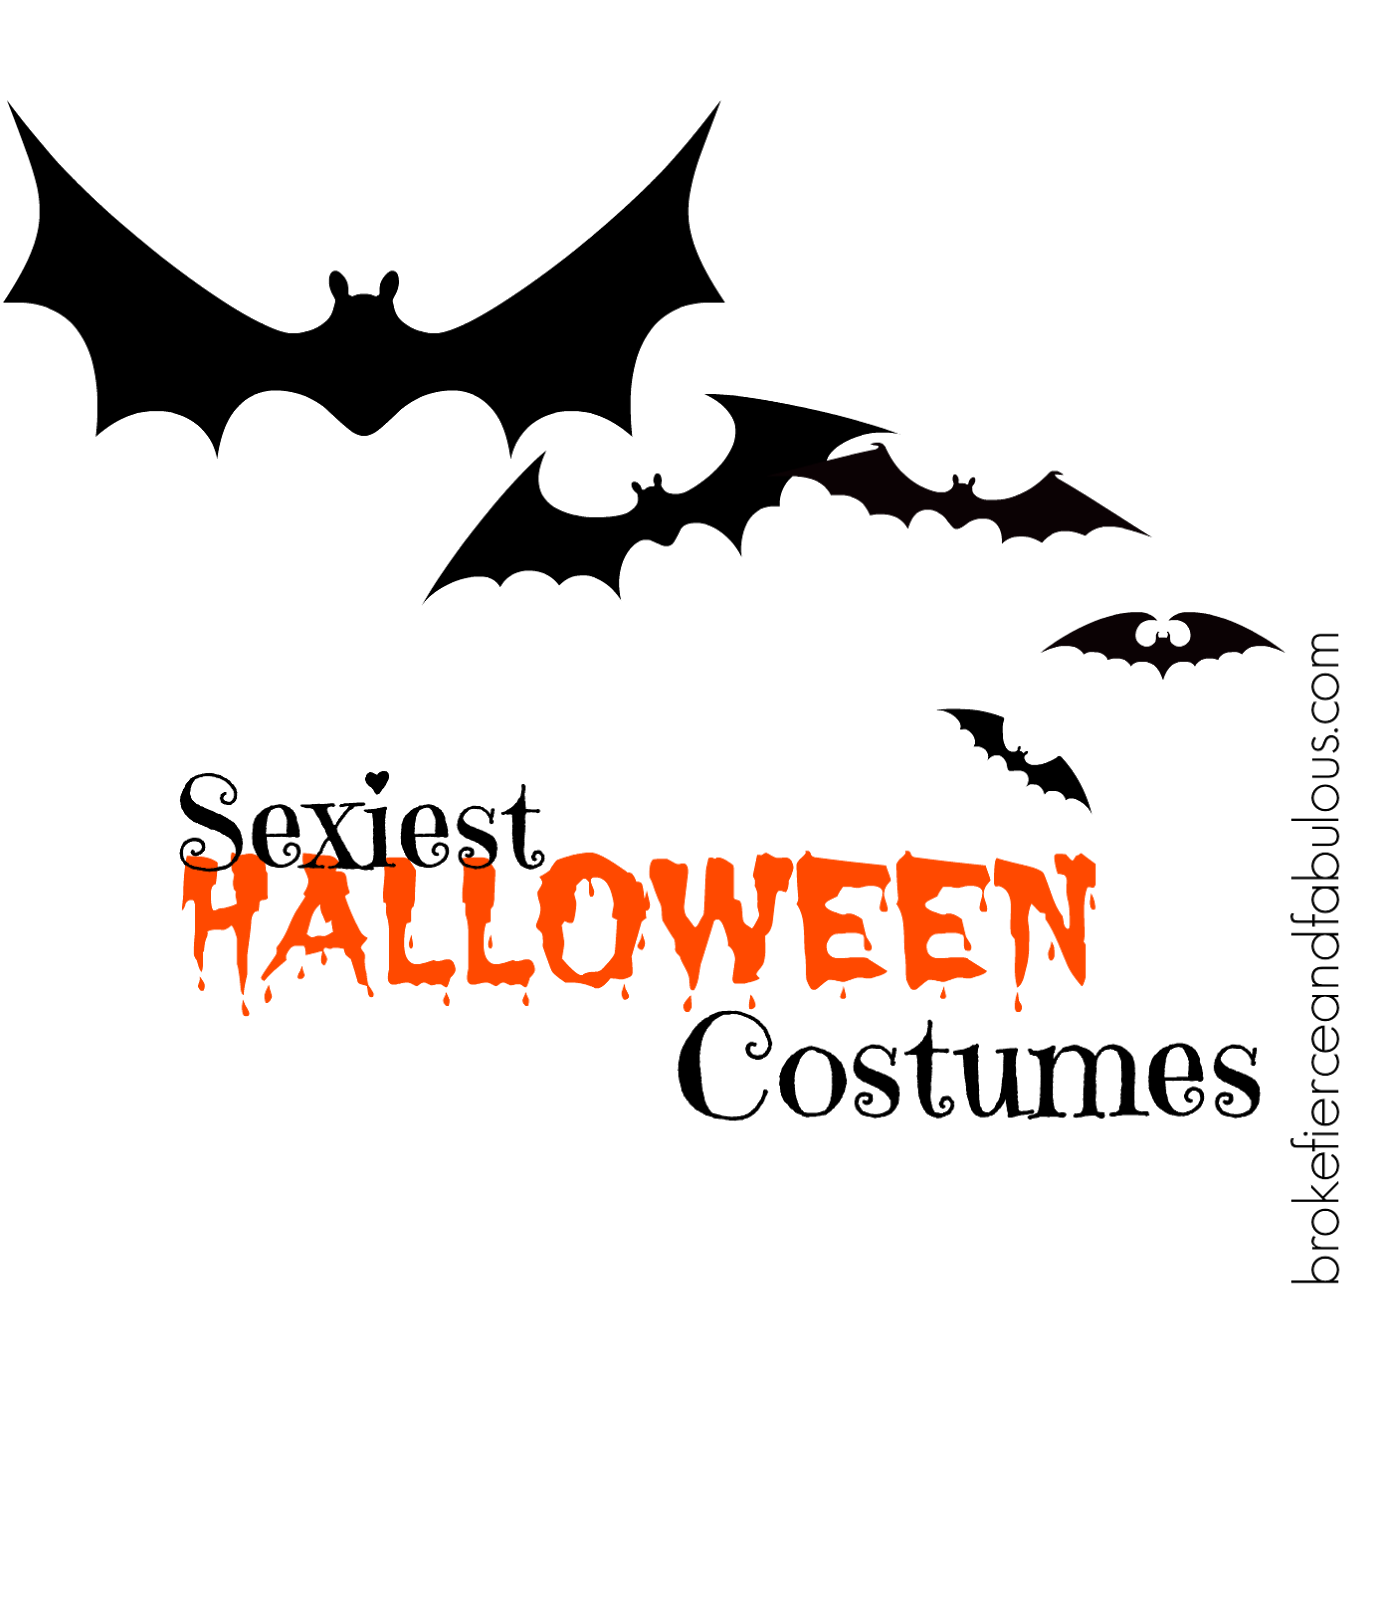 title, sexiest halloween costumes, hottest costumes, halloween costumes, halloween, bats, black bats, pinnable halloween banner